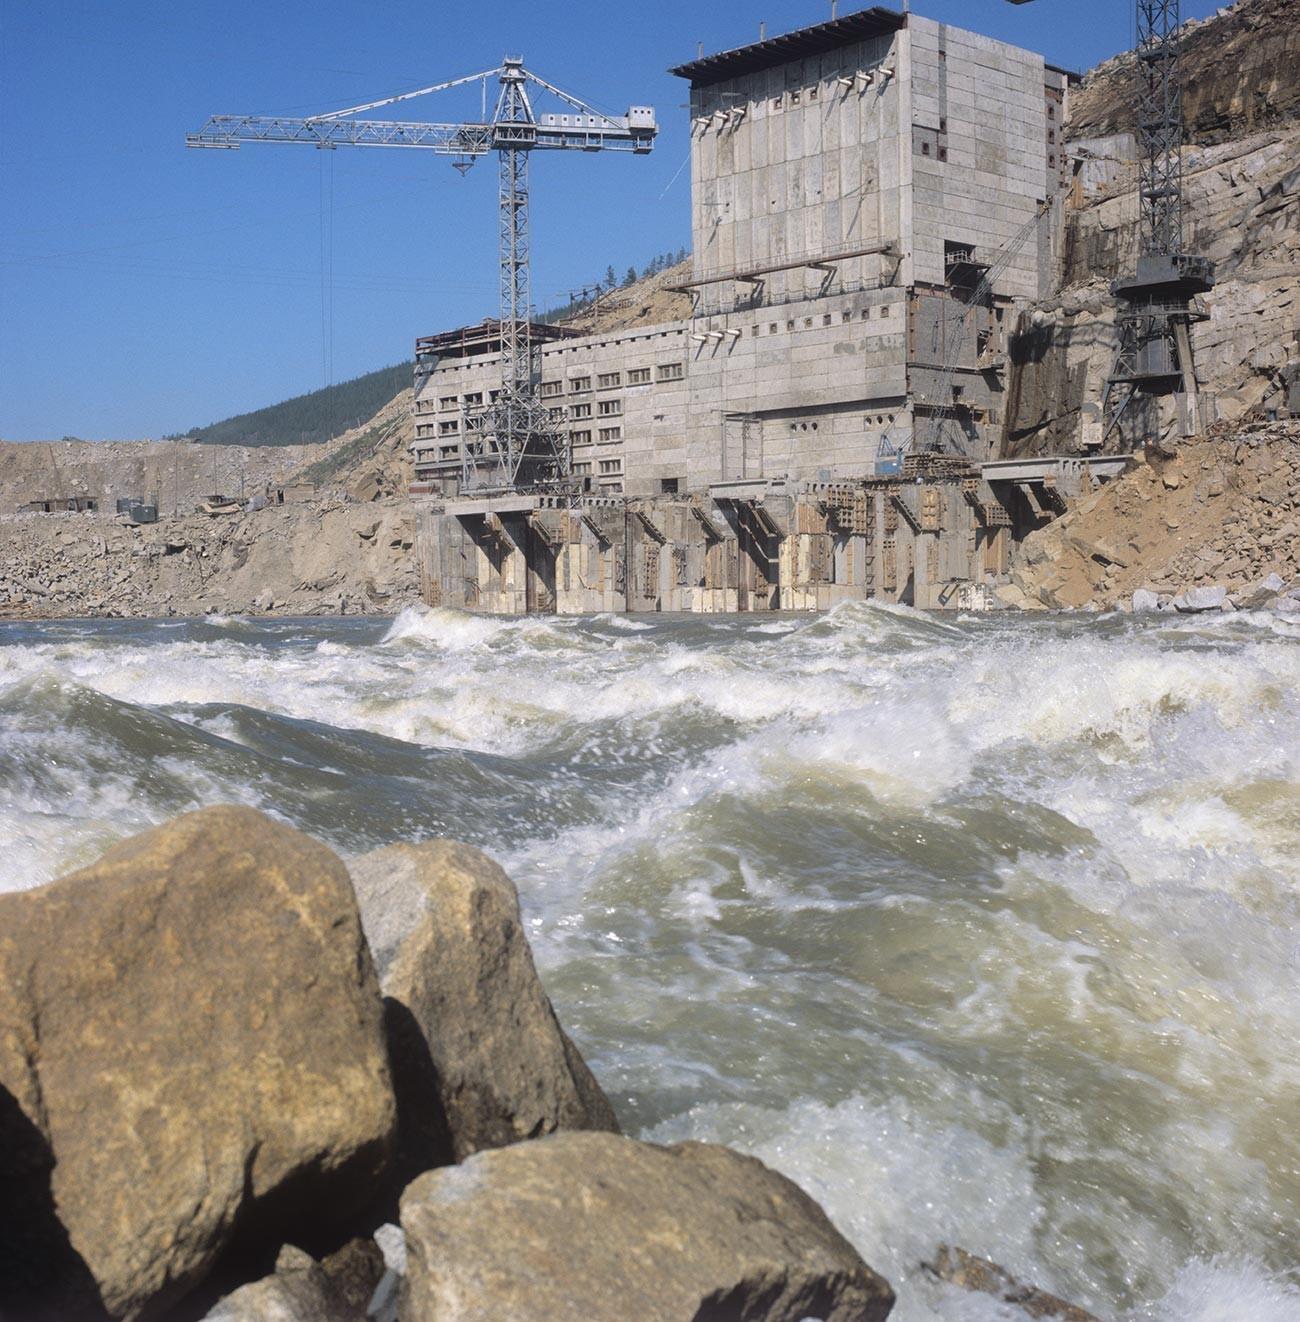 Izgradnja Kolimske hidroelektrane.